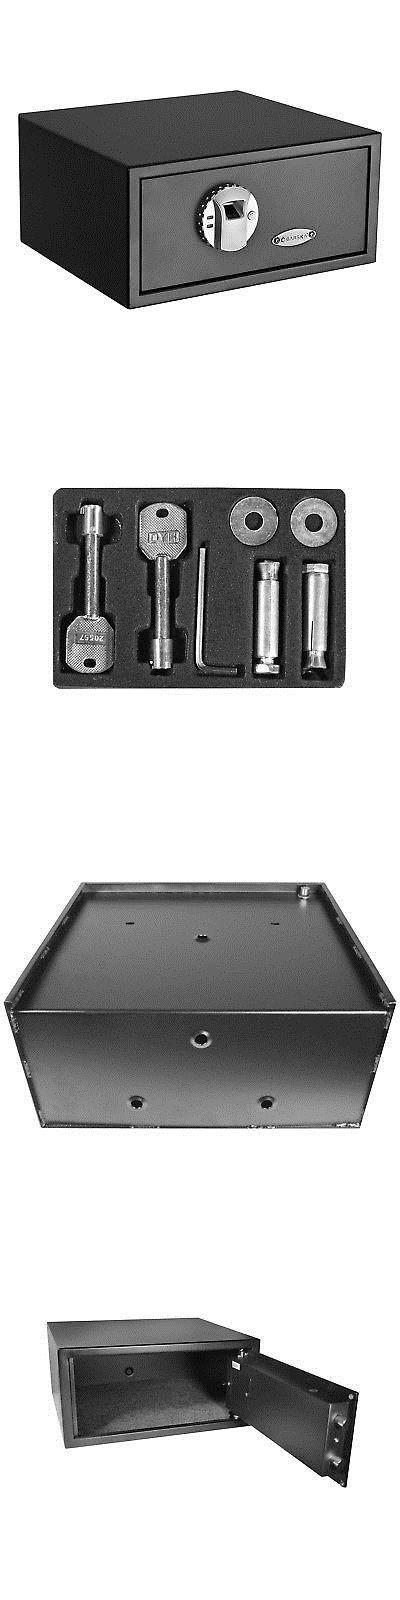 Cabinets and Safes 177877: Barska Biometric Fingerprint Safe Ax11224 -> BUY IT NOW ONLY: $158.99 on eBay!